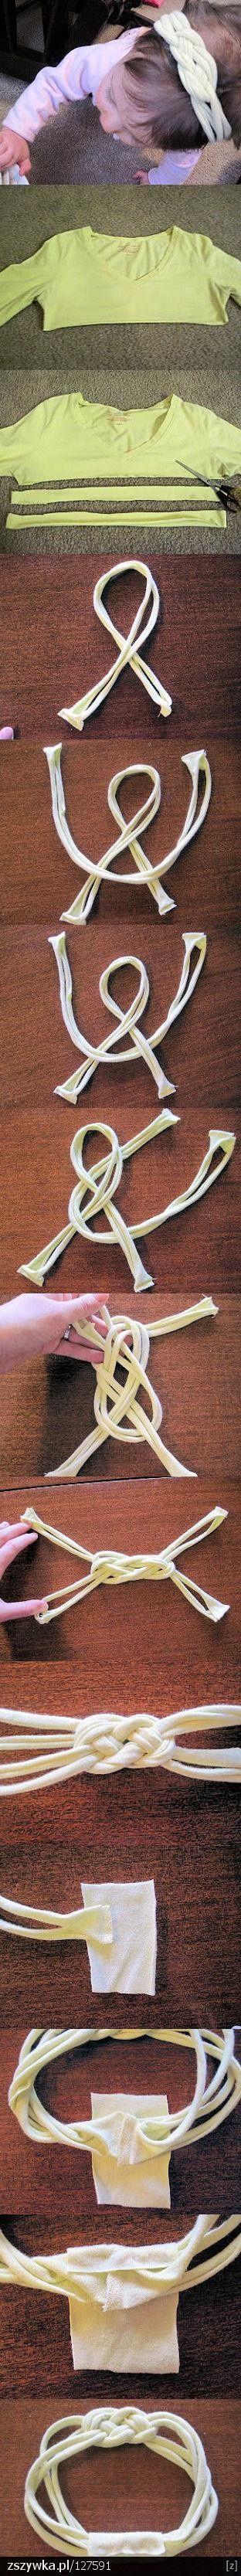 diy / homemade headband from knit tshirt @ DIY Home Ideas